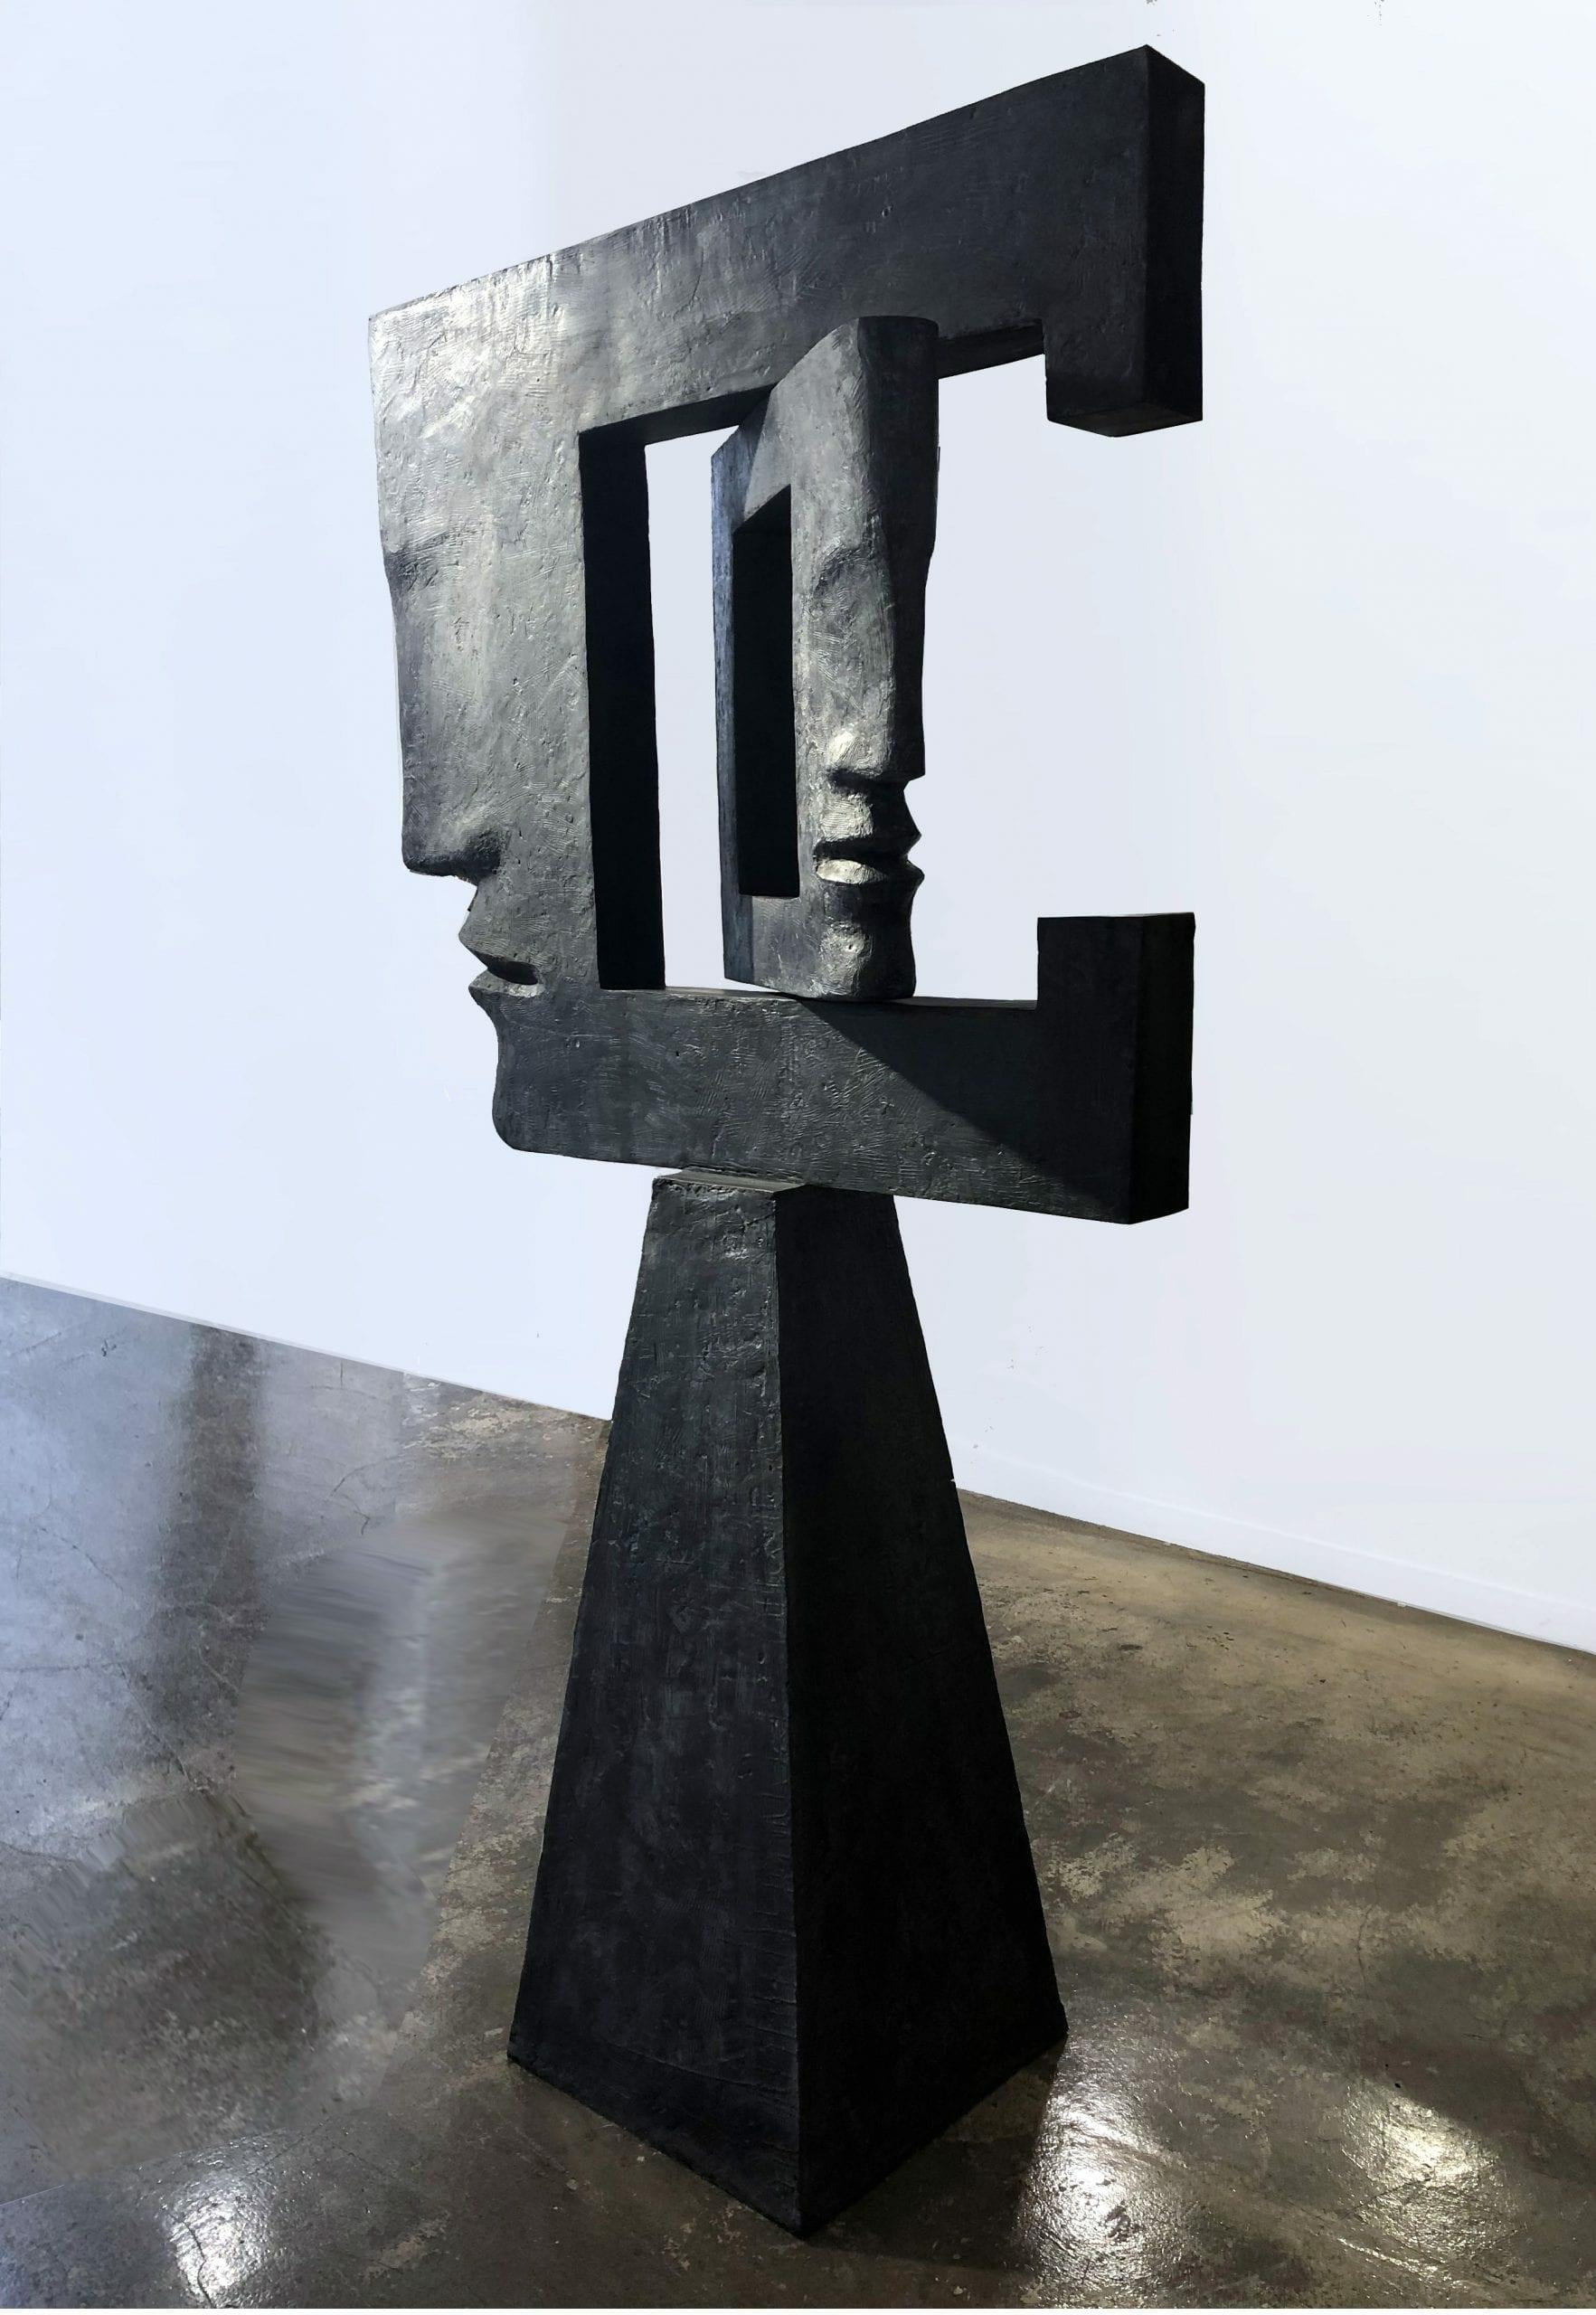 REVERSO II Bronze 205x115x46cm / 80,7x45,2x18,1 inches